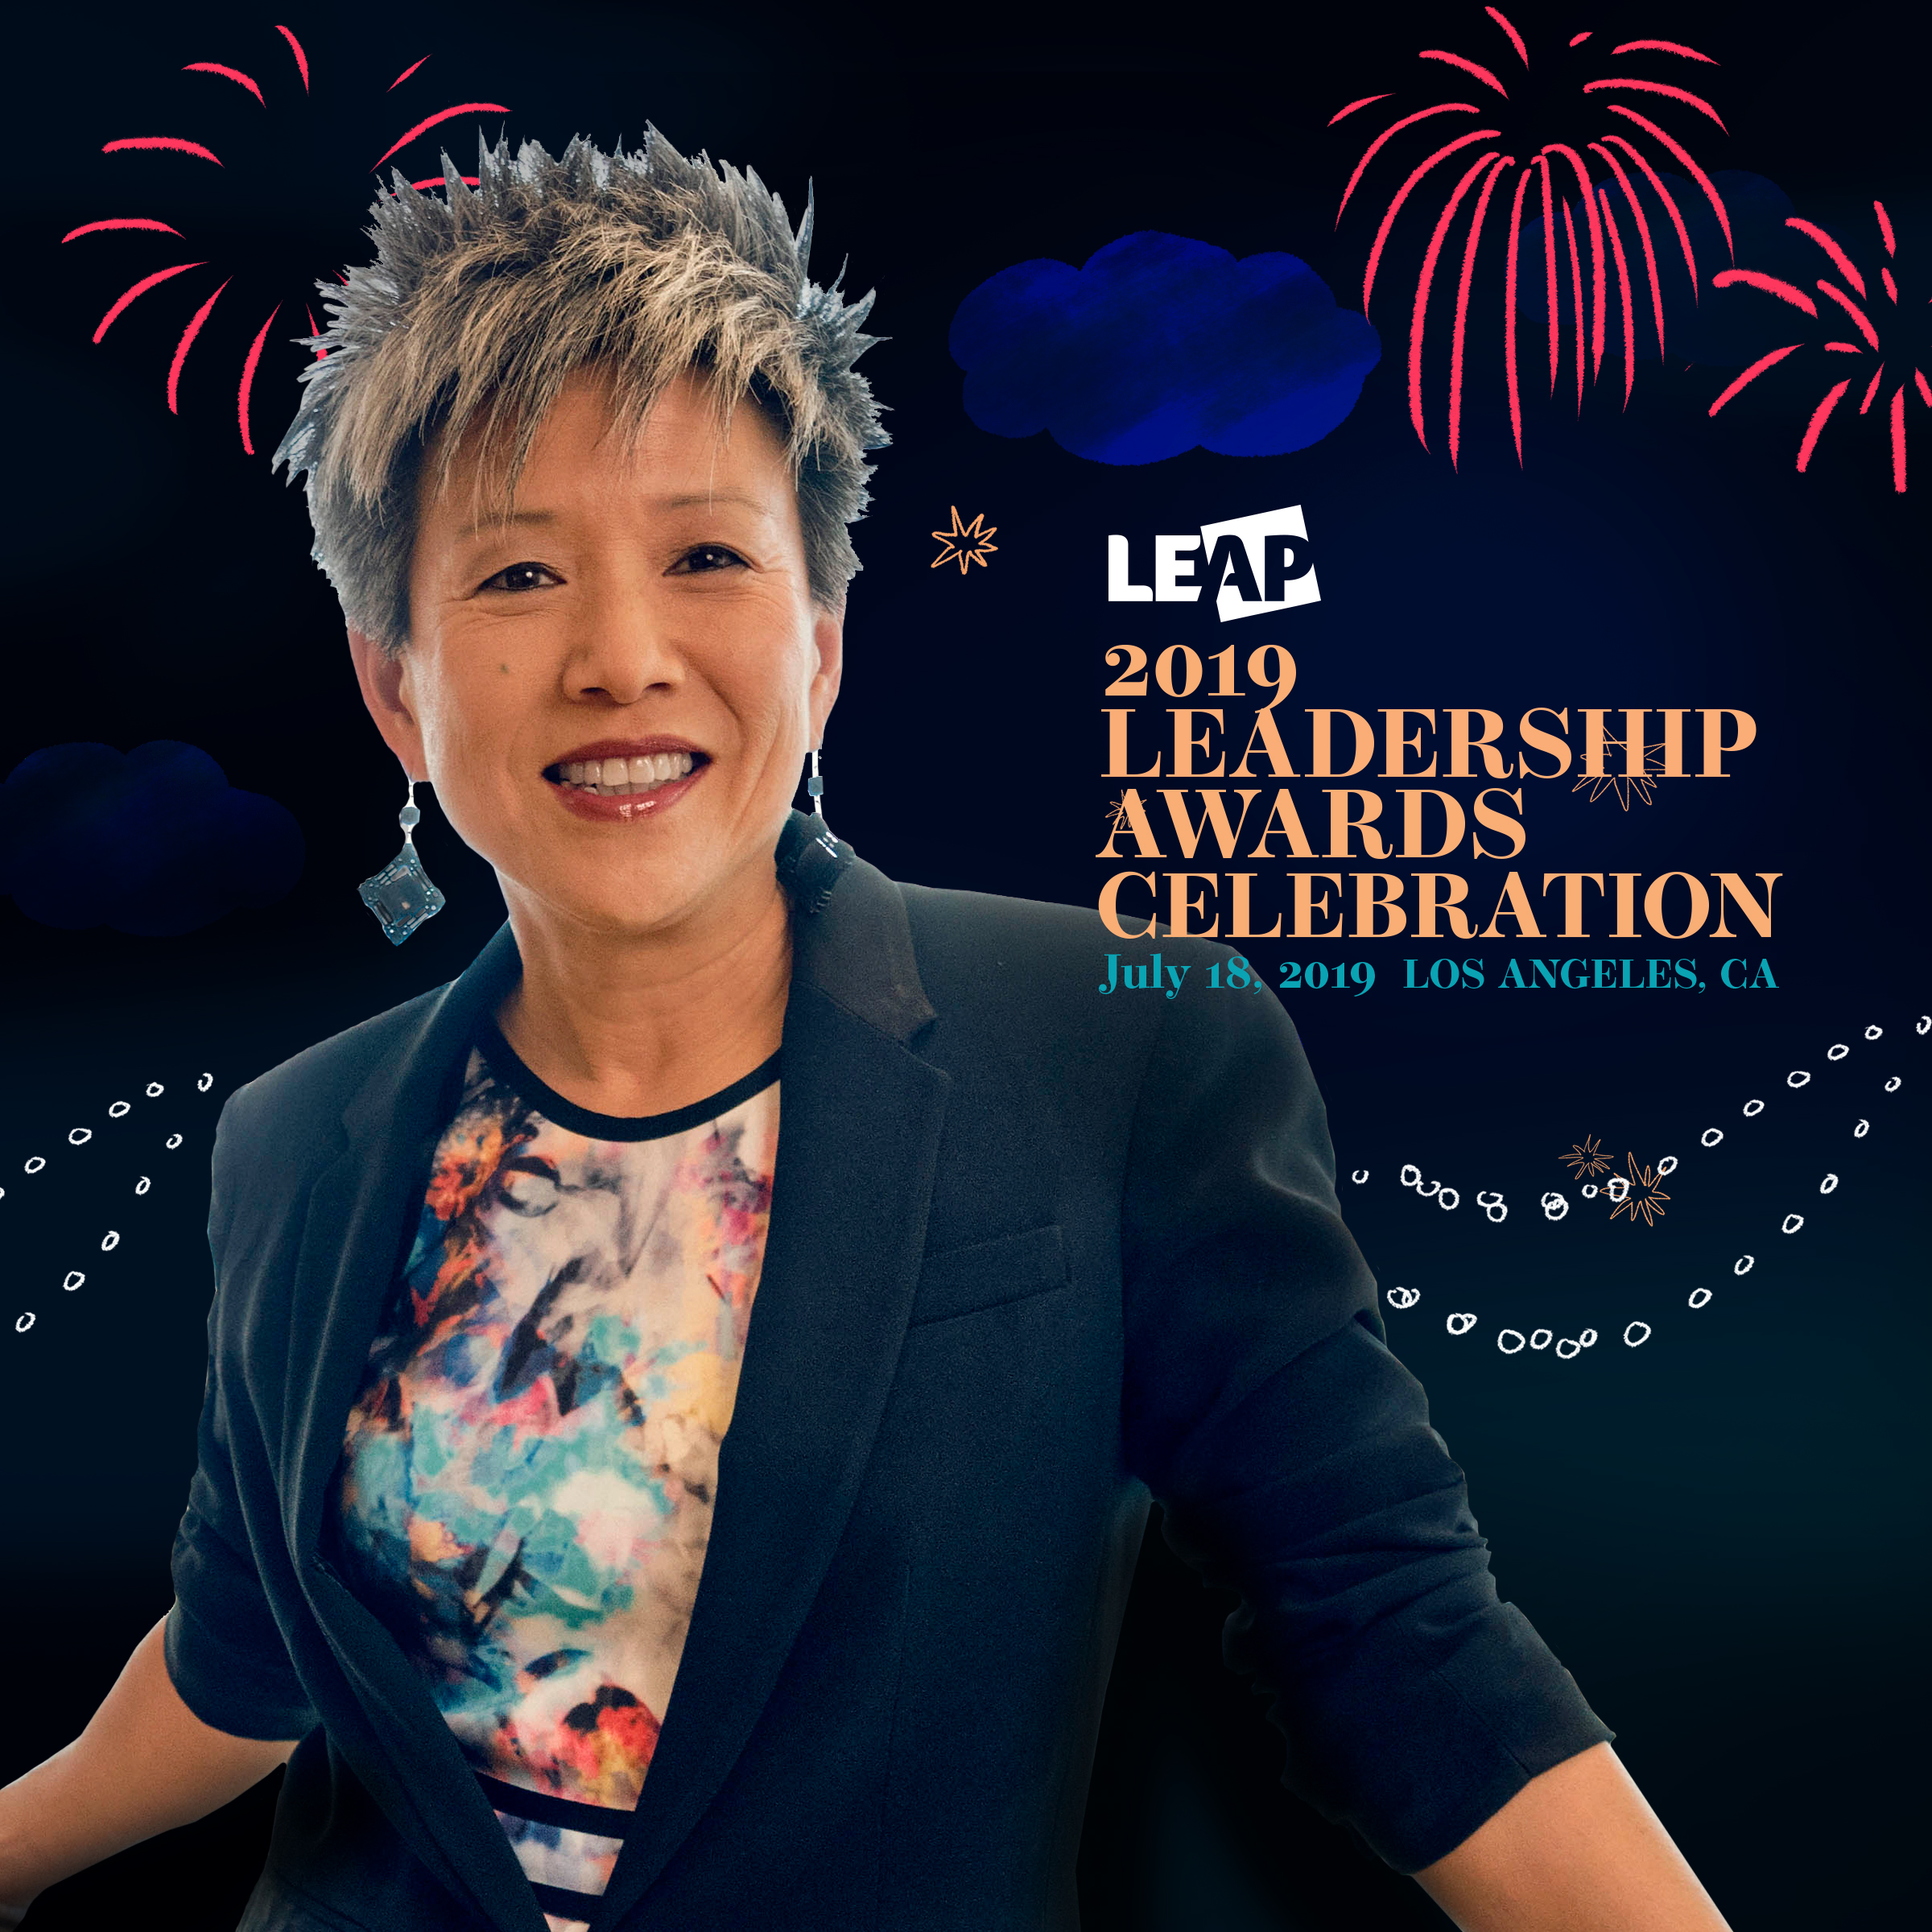 LEAP-2019-Honoree-Headshot-SusanJinDavis2.jpg